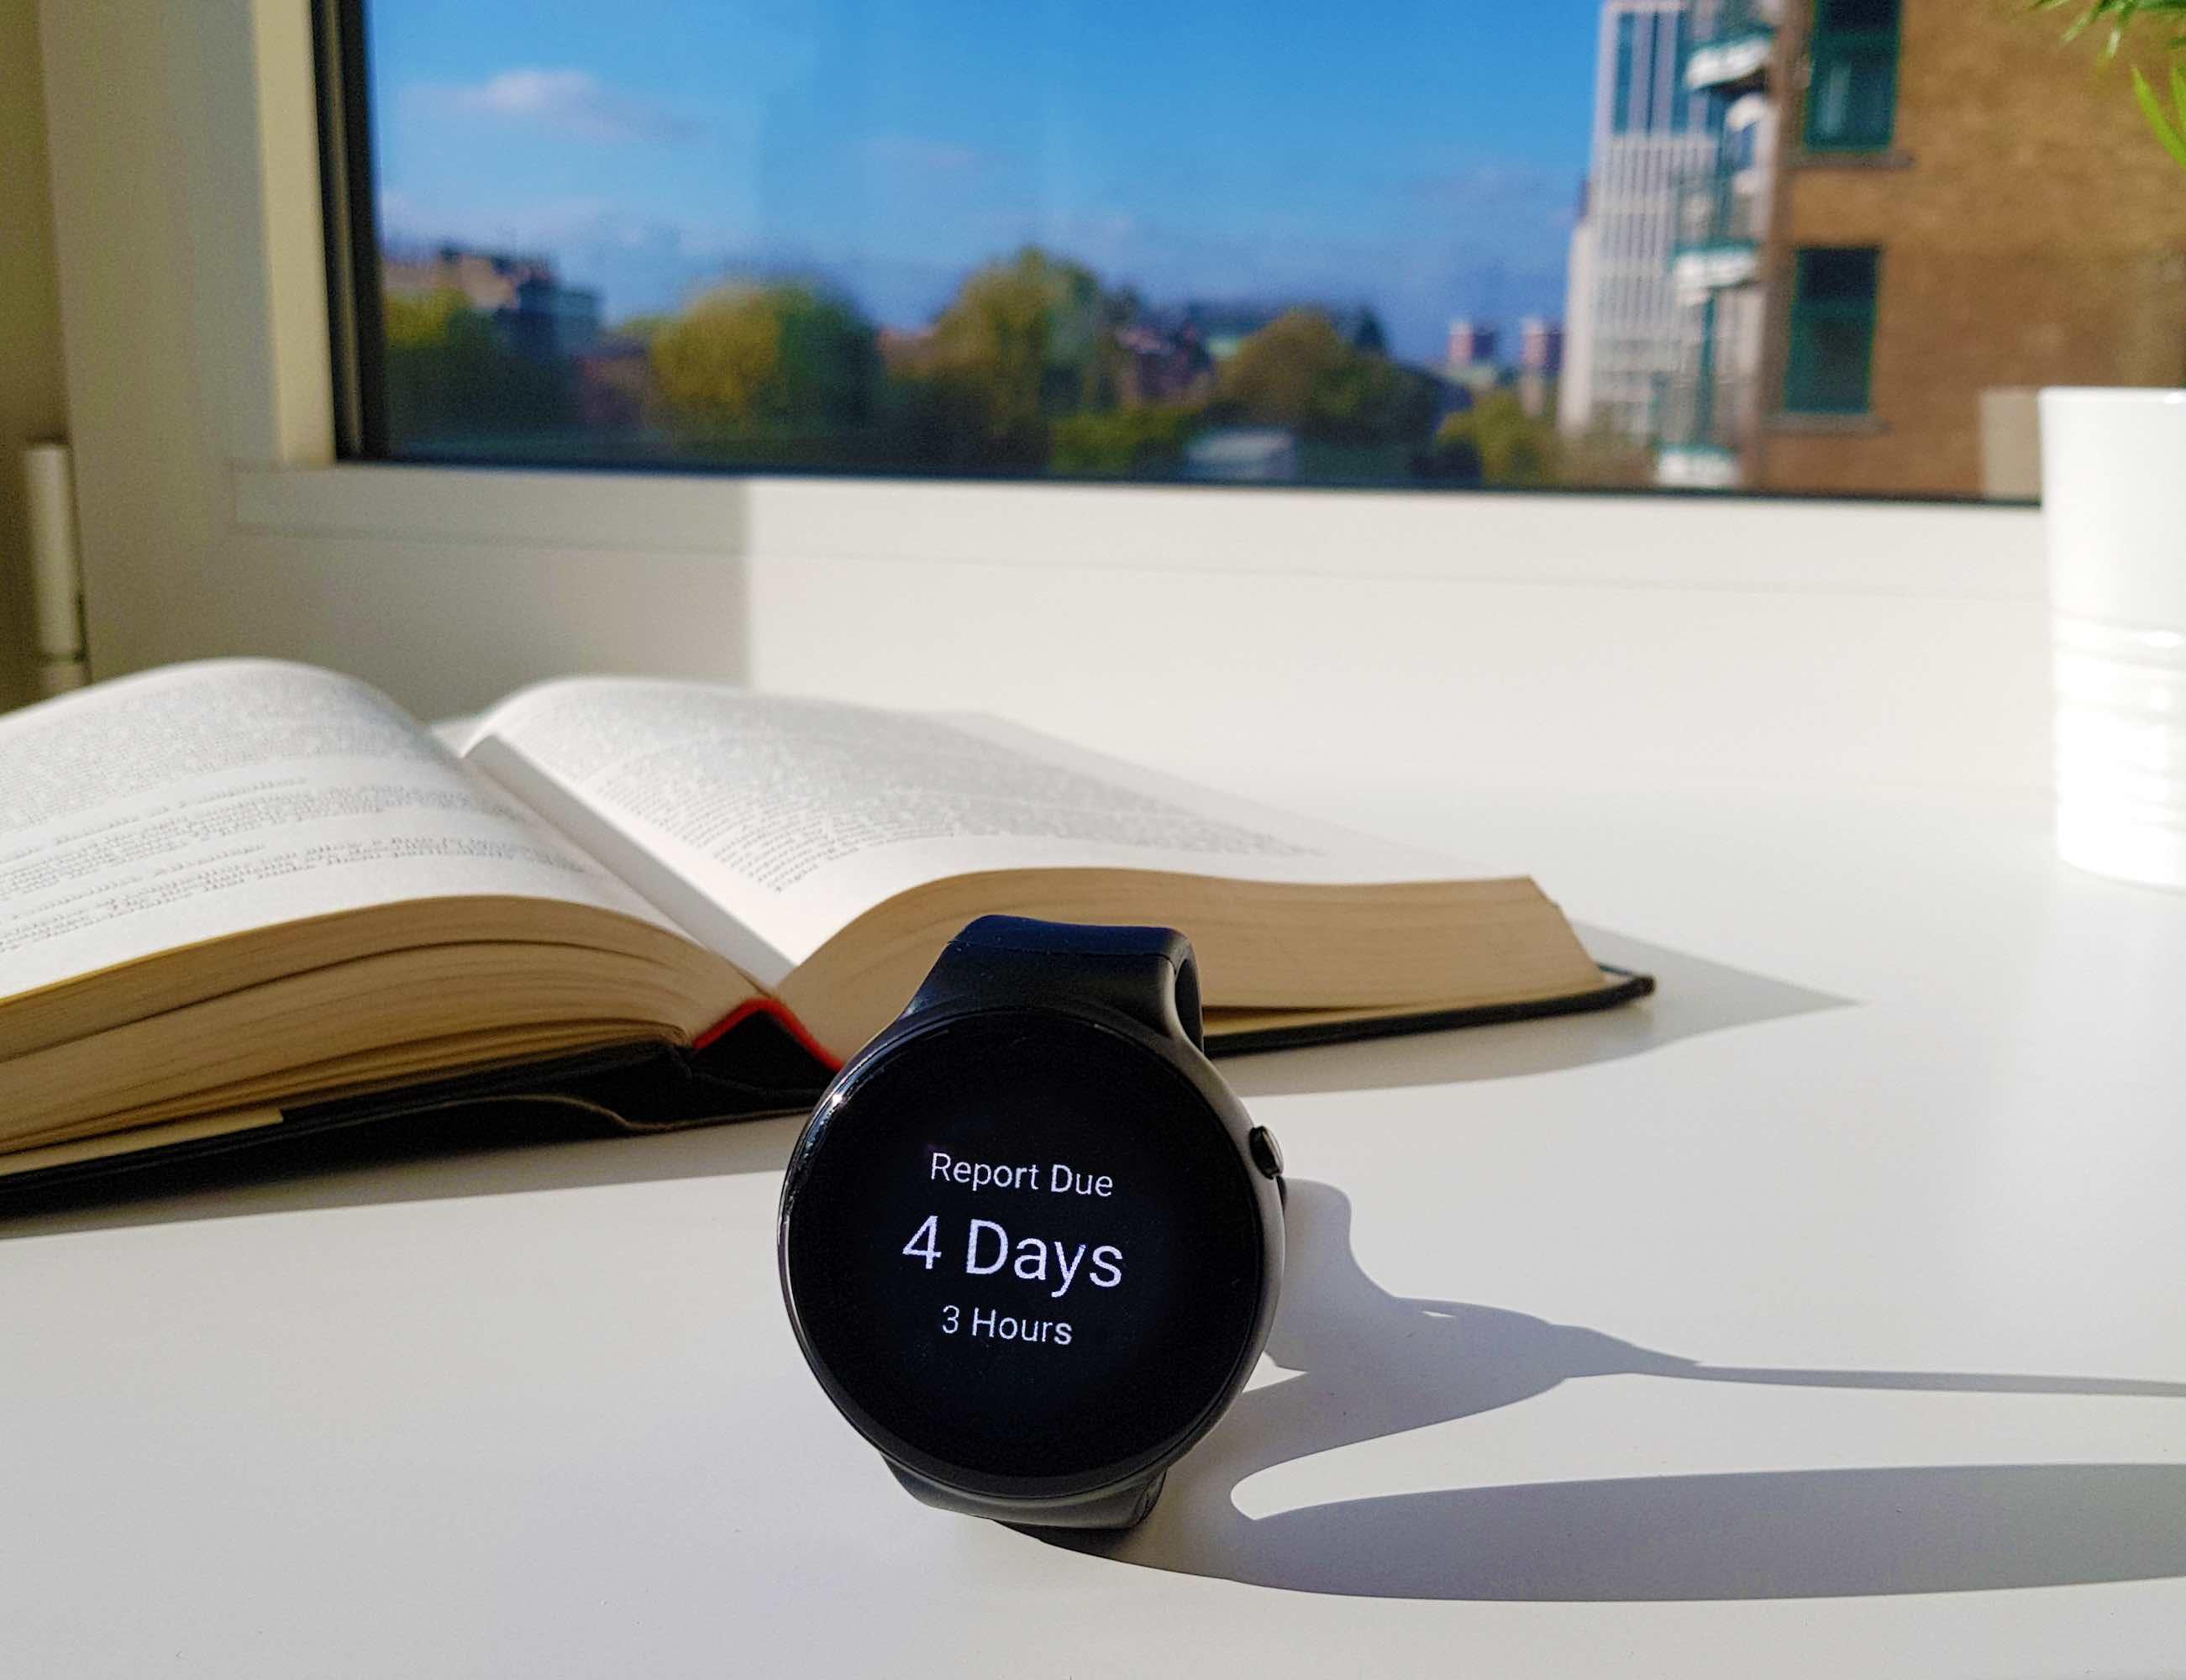 emit Minimalist Productivity Smartwatch